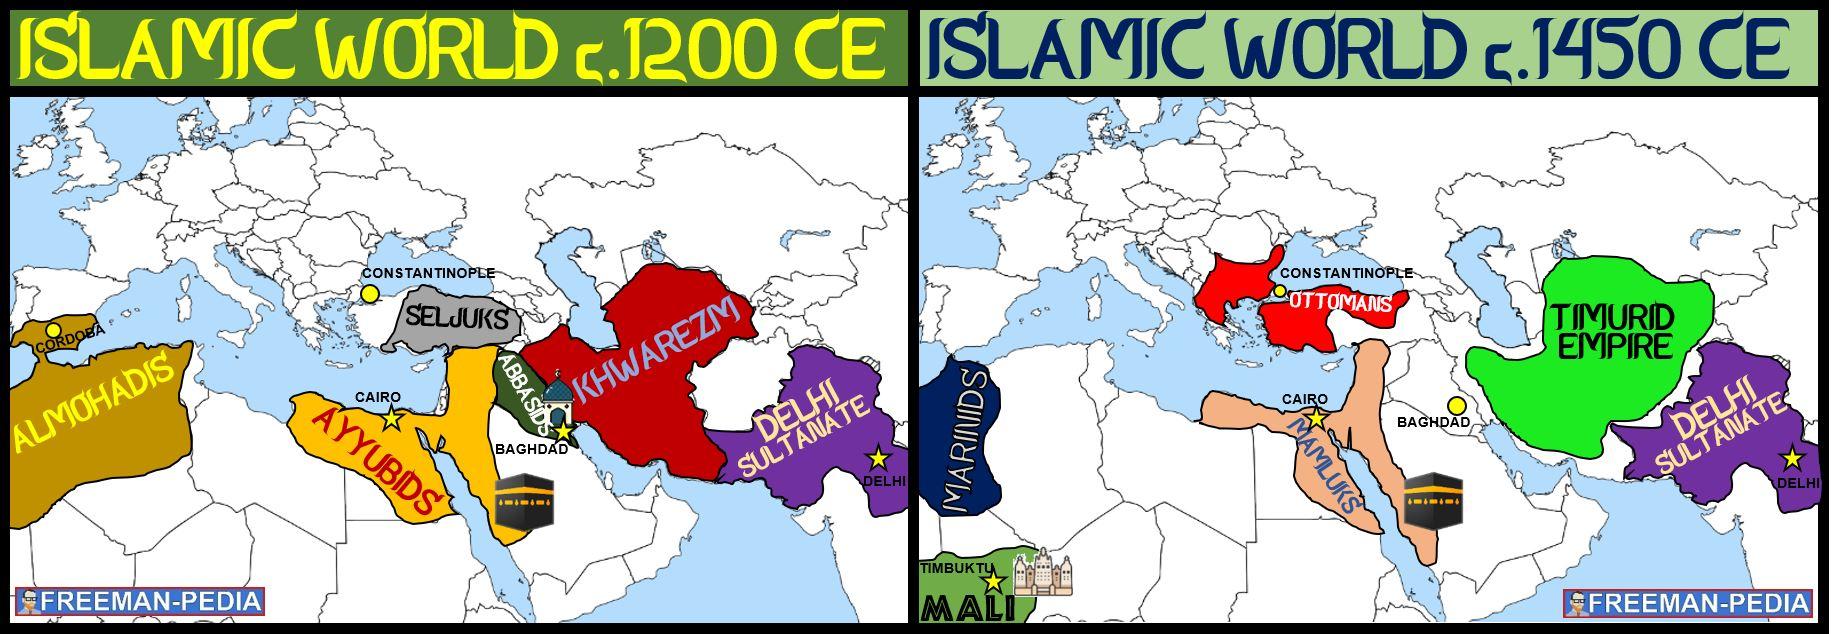 FRACTURING ISLAMIC EMPIRES ISLAMIC WORLD 1200 ISLAMIC WORLD 1450 AP WORLD MODERN FREEMANPEDIA.JPG